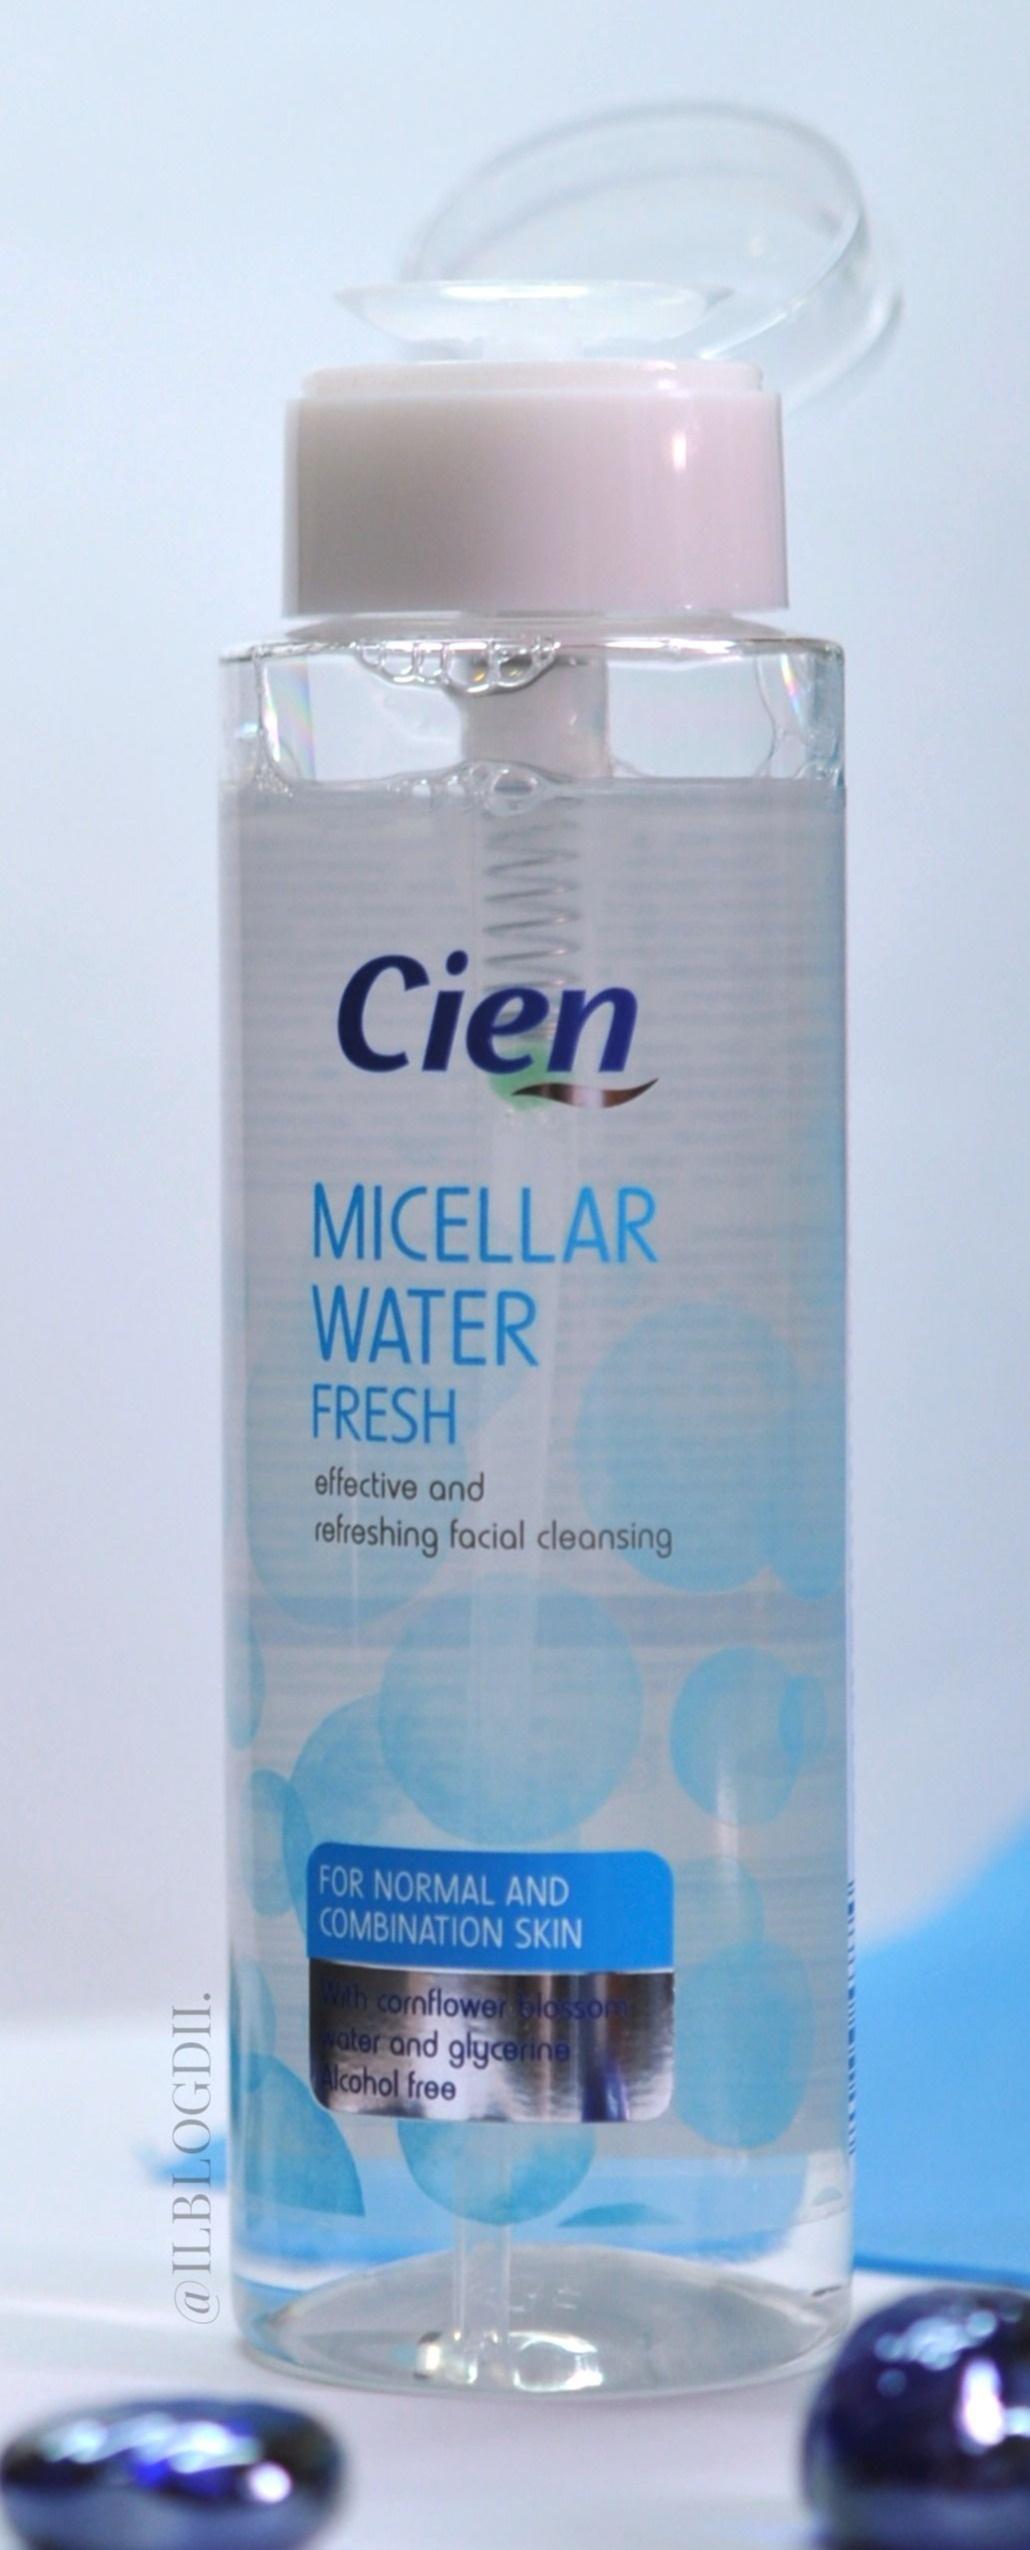 Cien Micellar Water